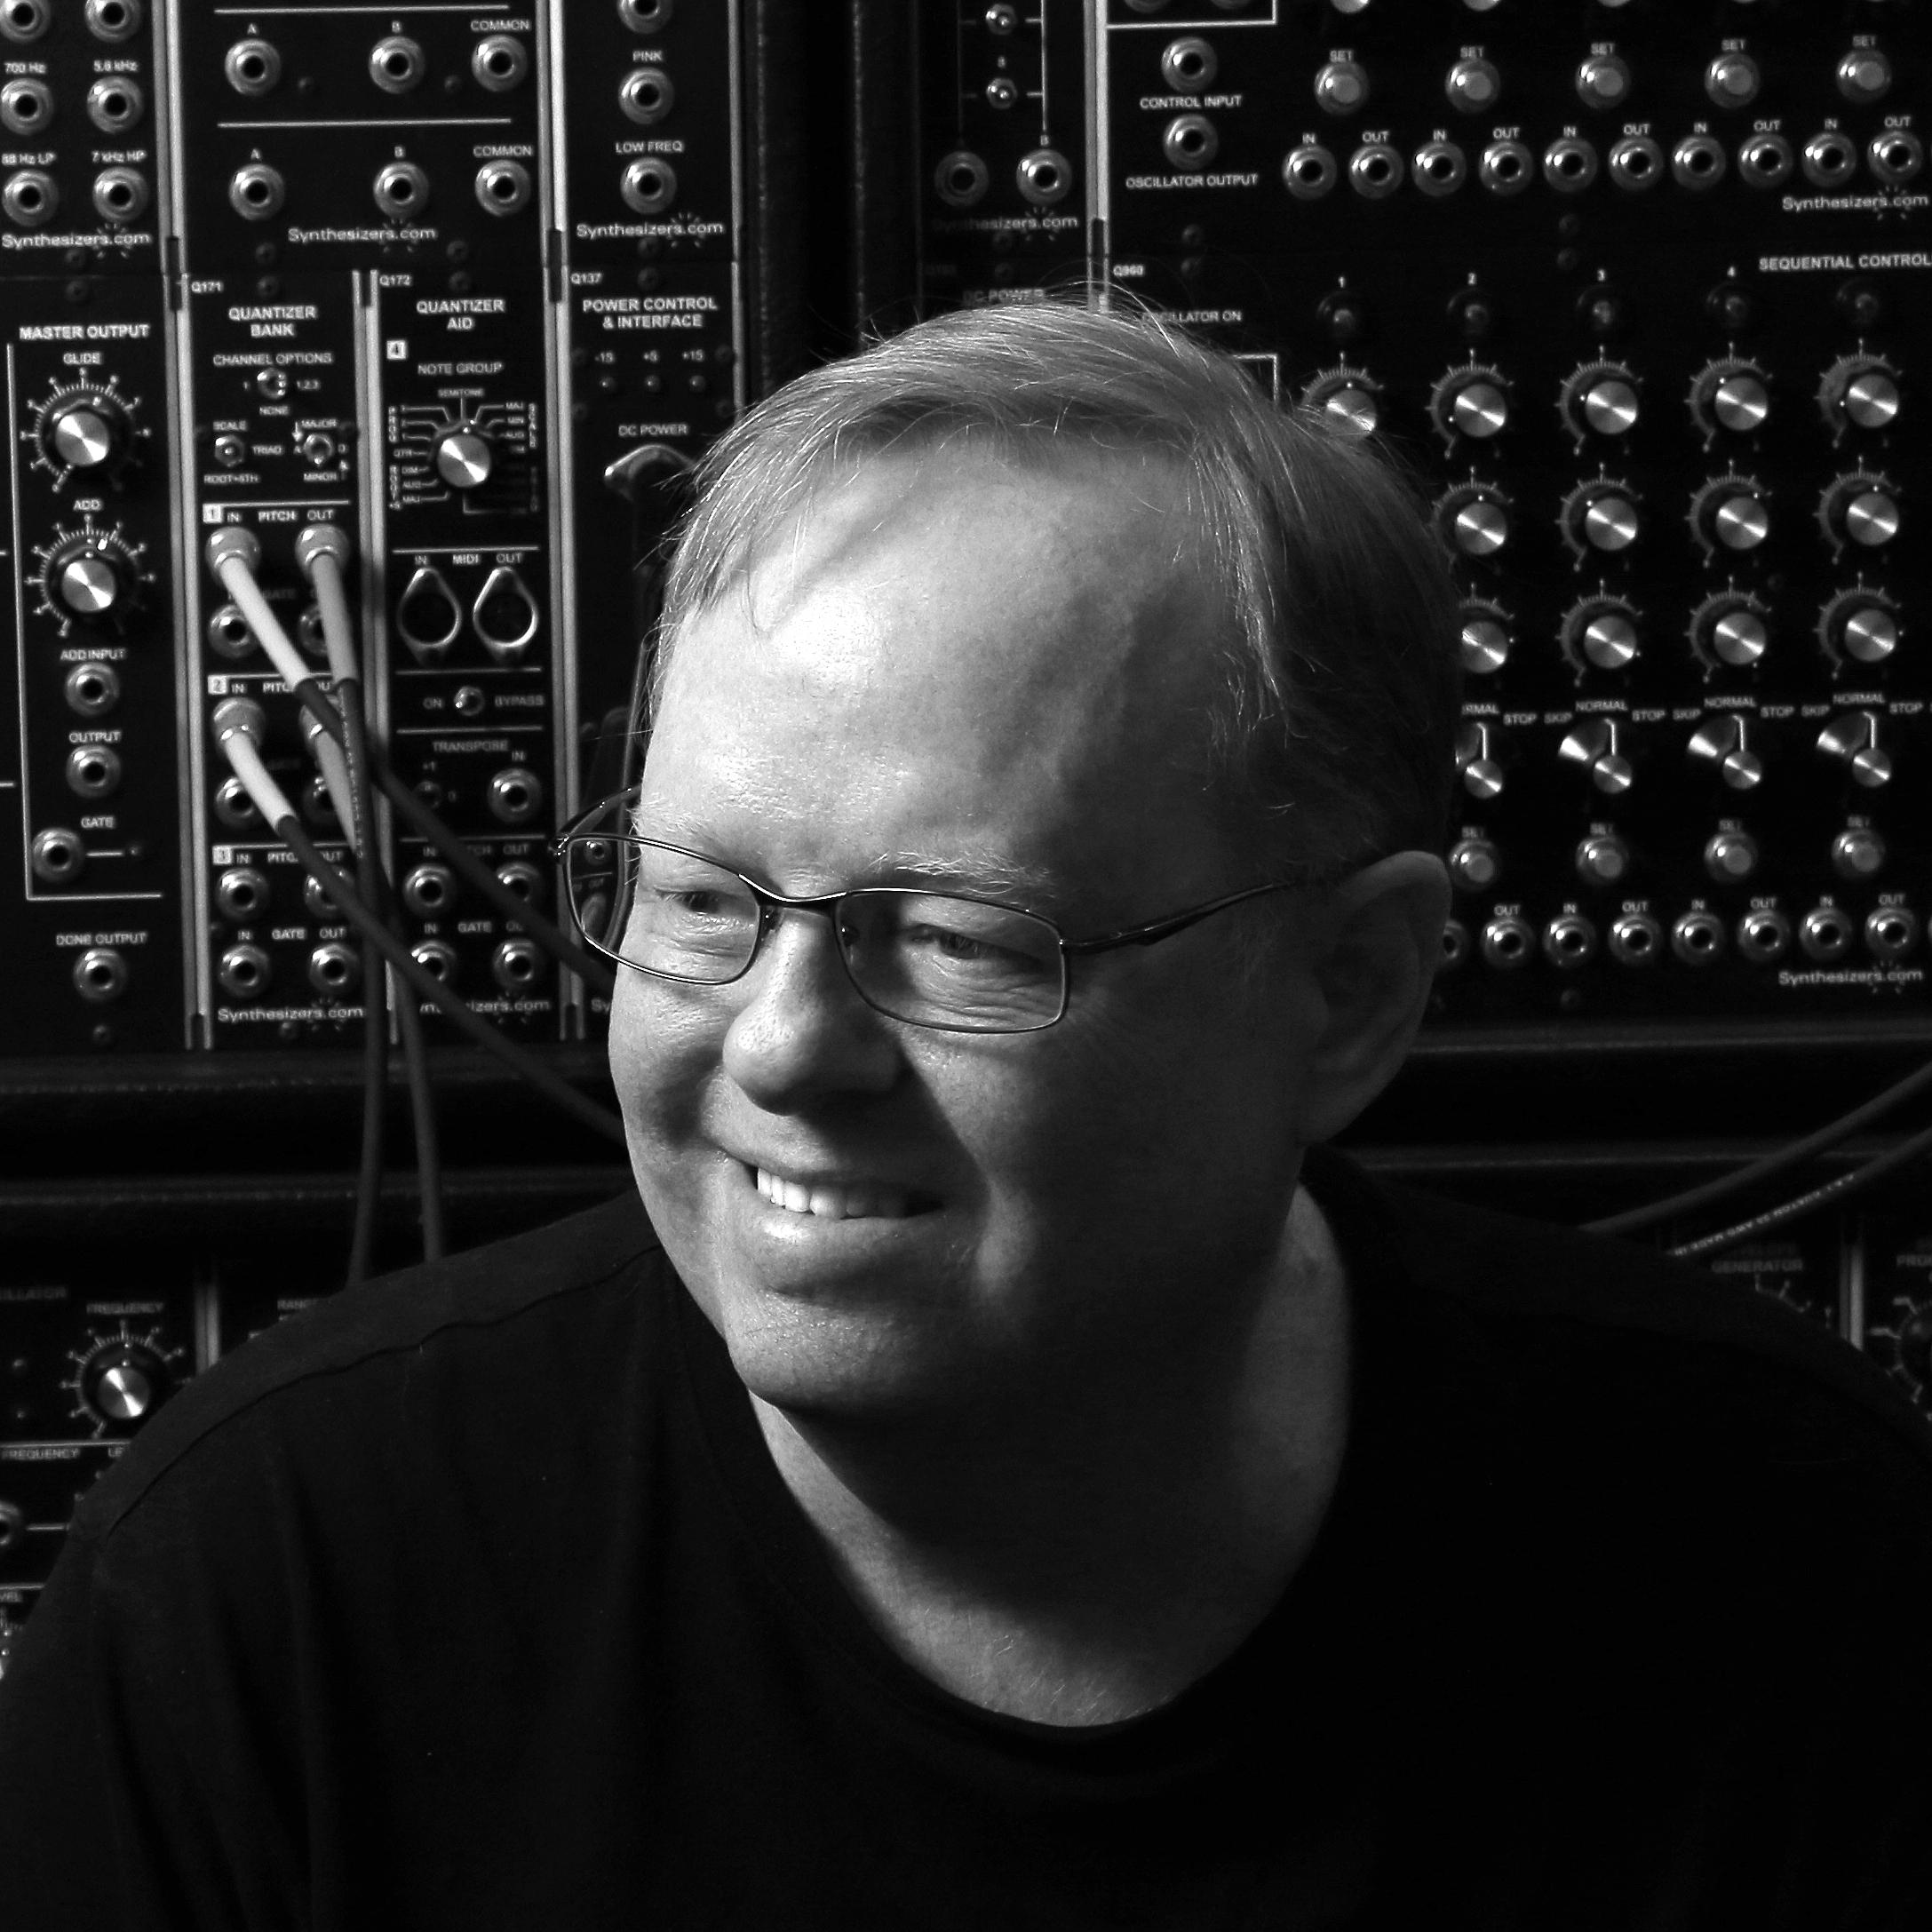 Software Synthesizer Sound Desi - robinja56 | ello